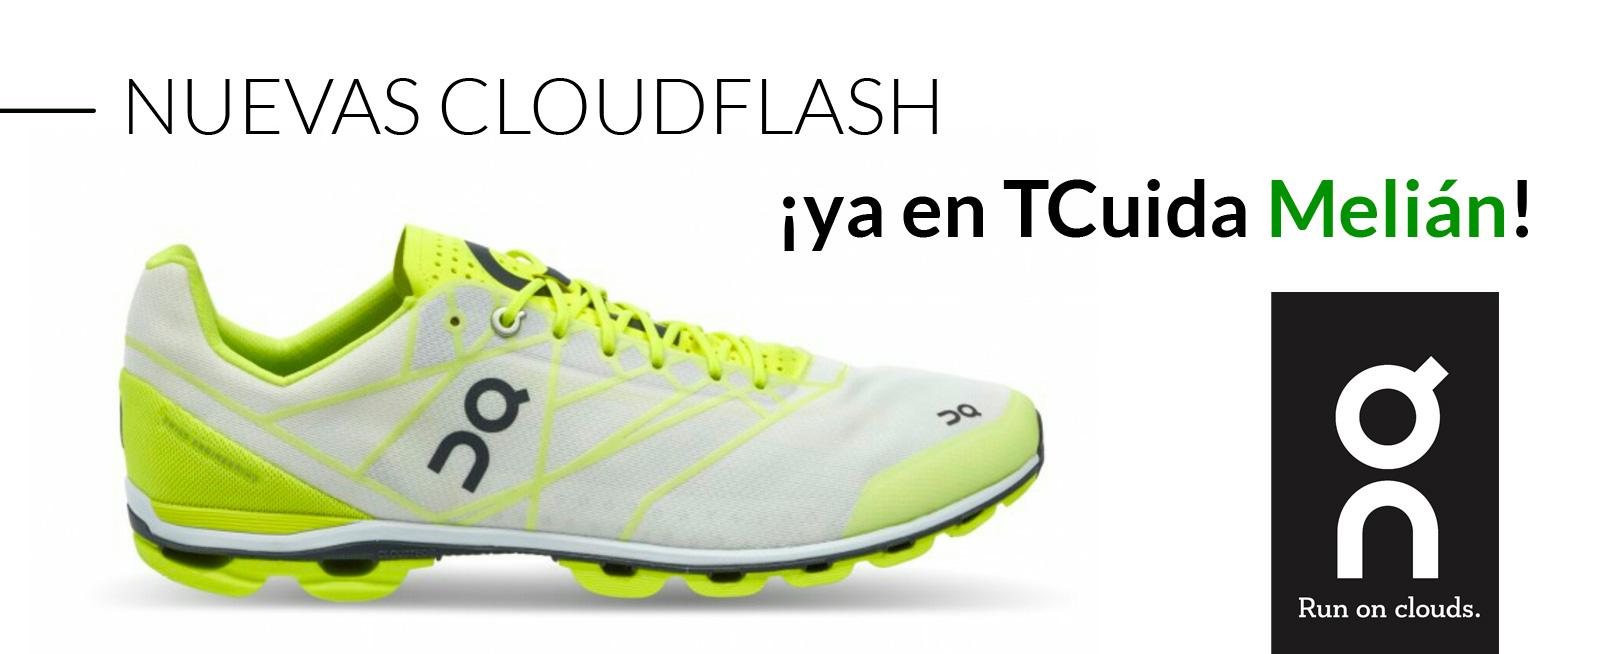 Tcuida-melian-on-running-cloudflash